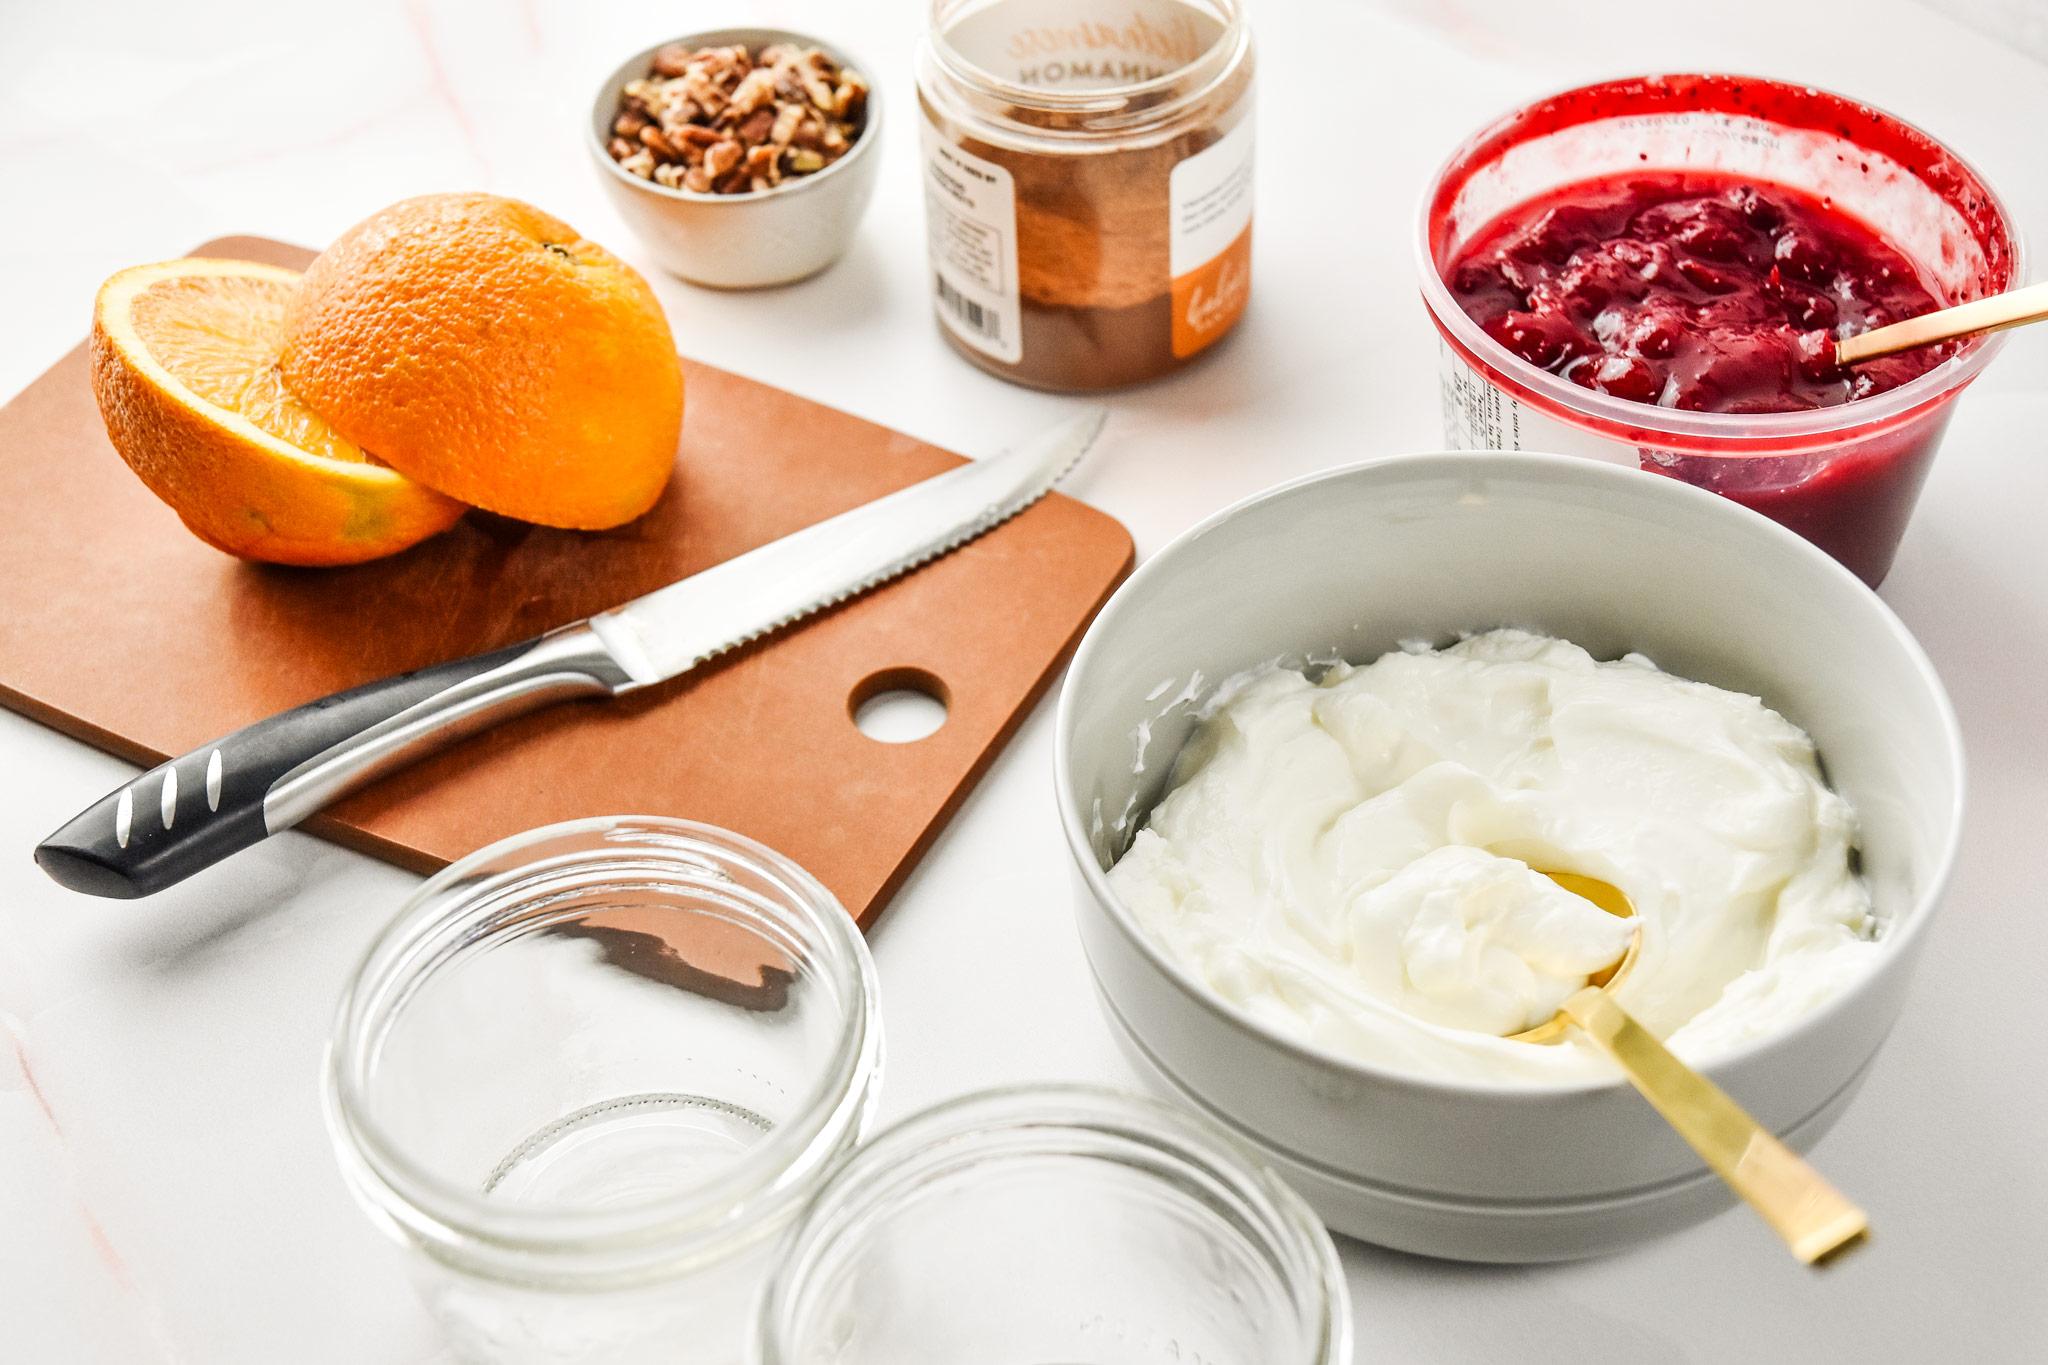 ingredients for the cinnamon orange cranberry yogurt parfaits